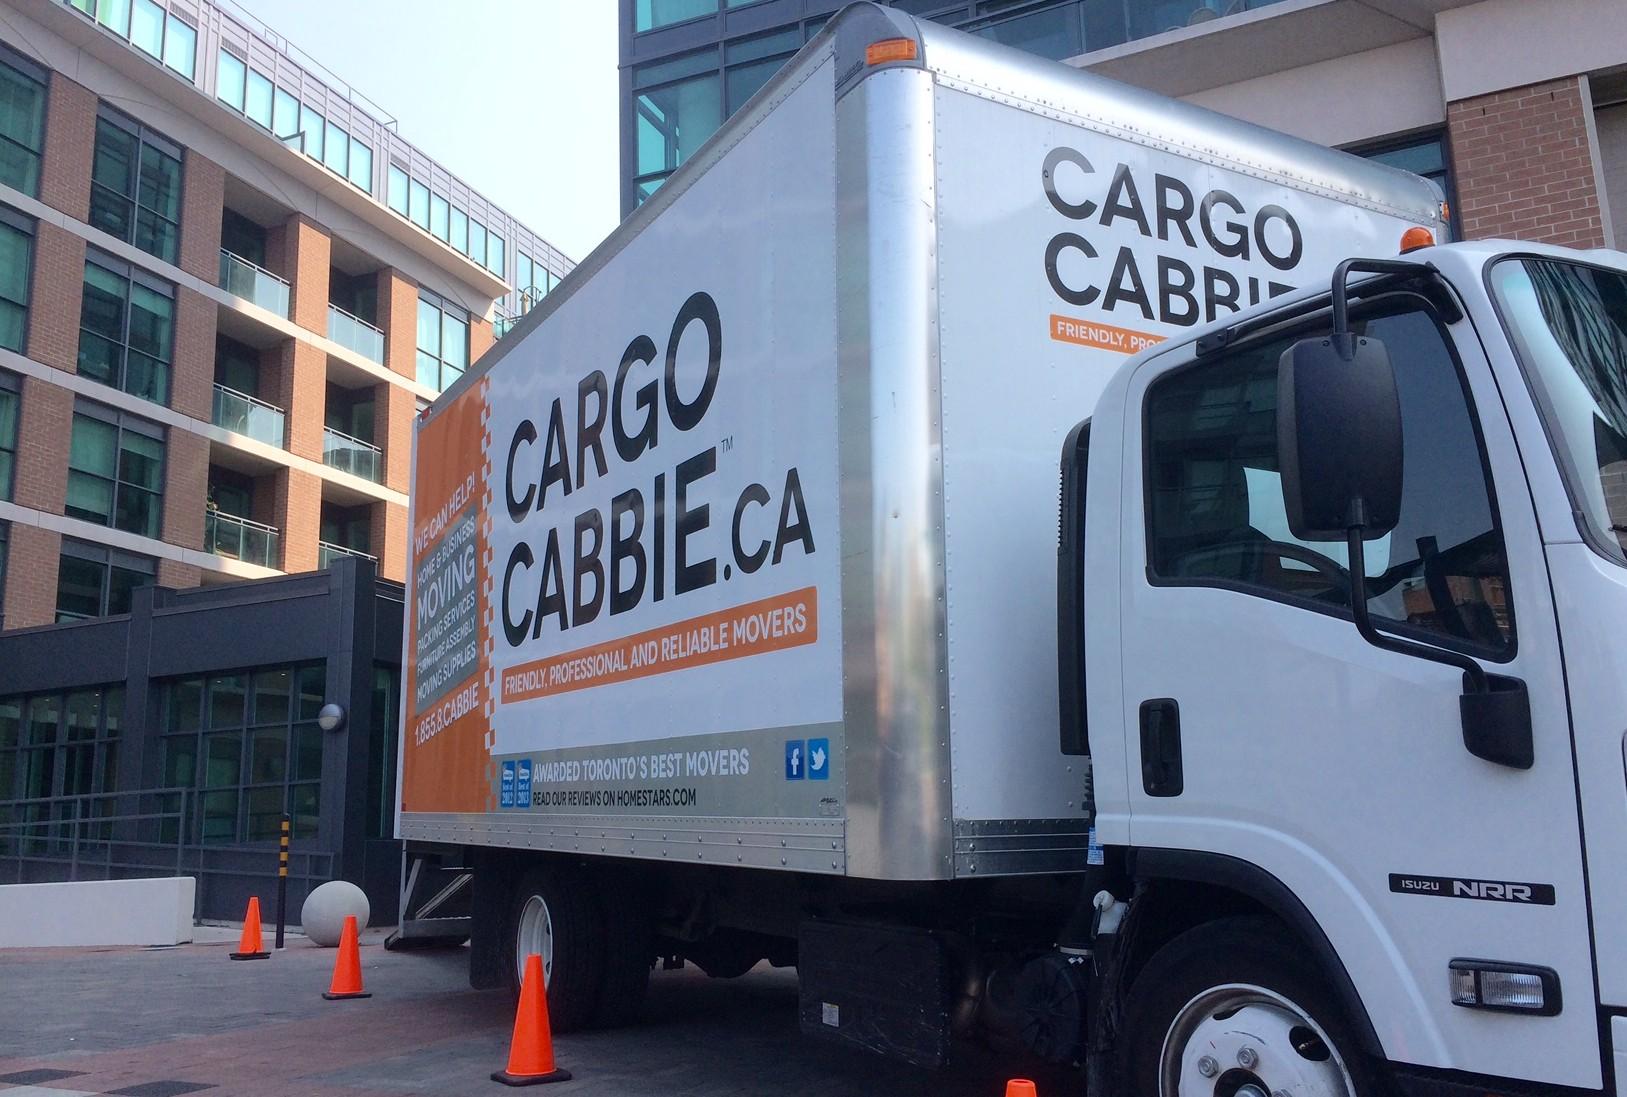 Cargo Cabbie condo movers 2014